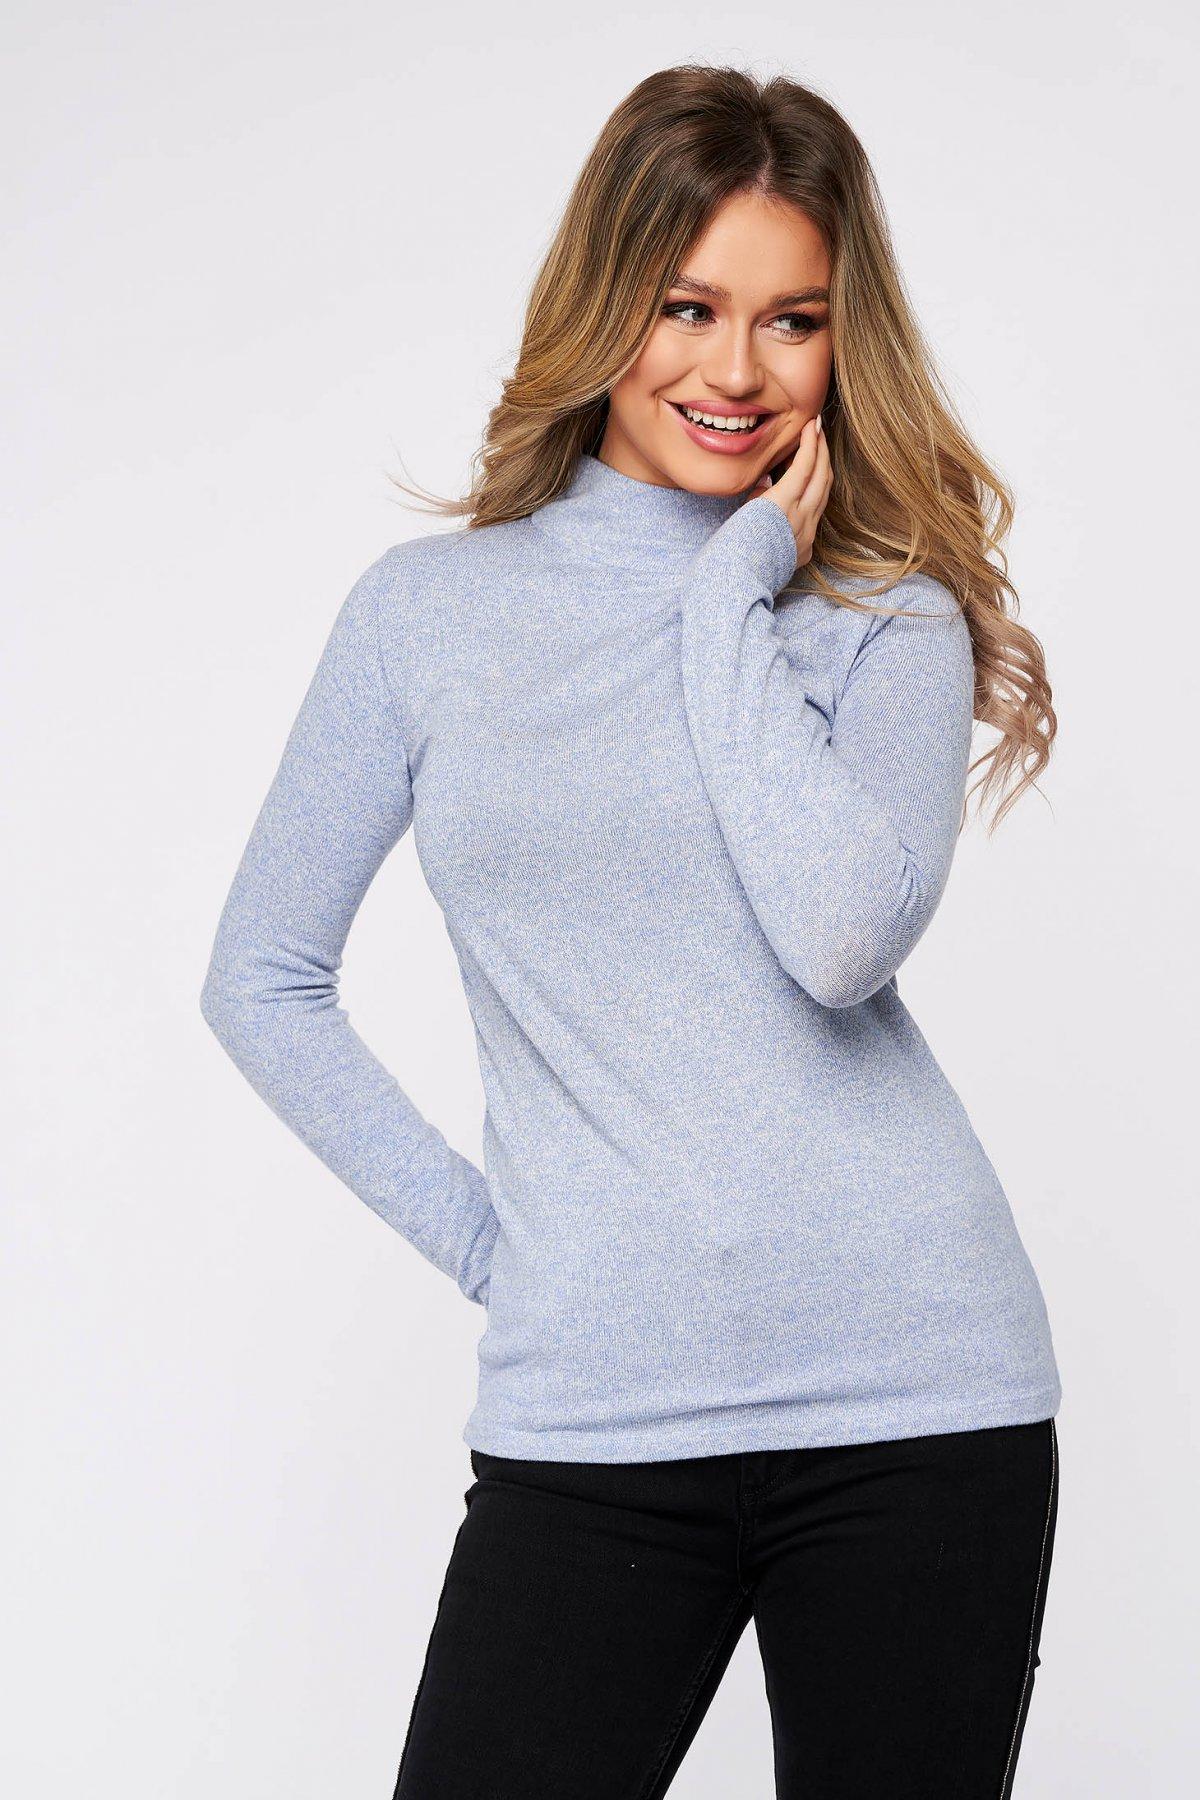 Bluza dama SunShine albastru-deschis din bumbac pe gat din material elastic si fin la atingere imagine